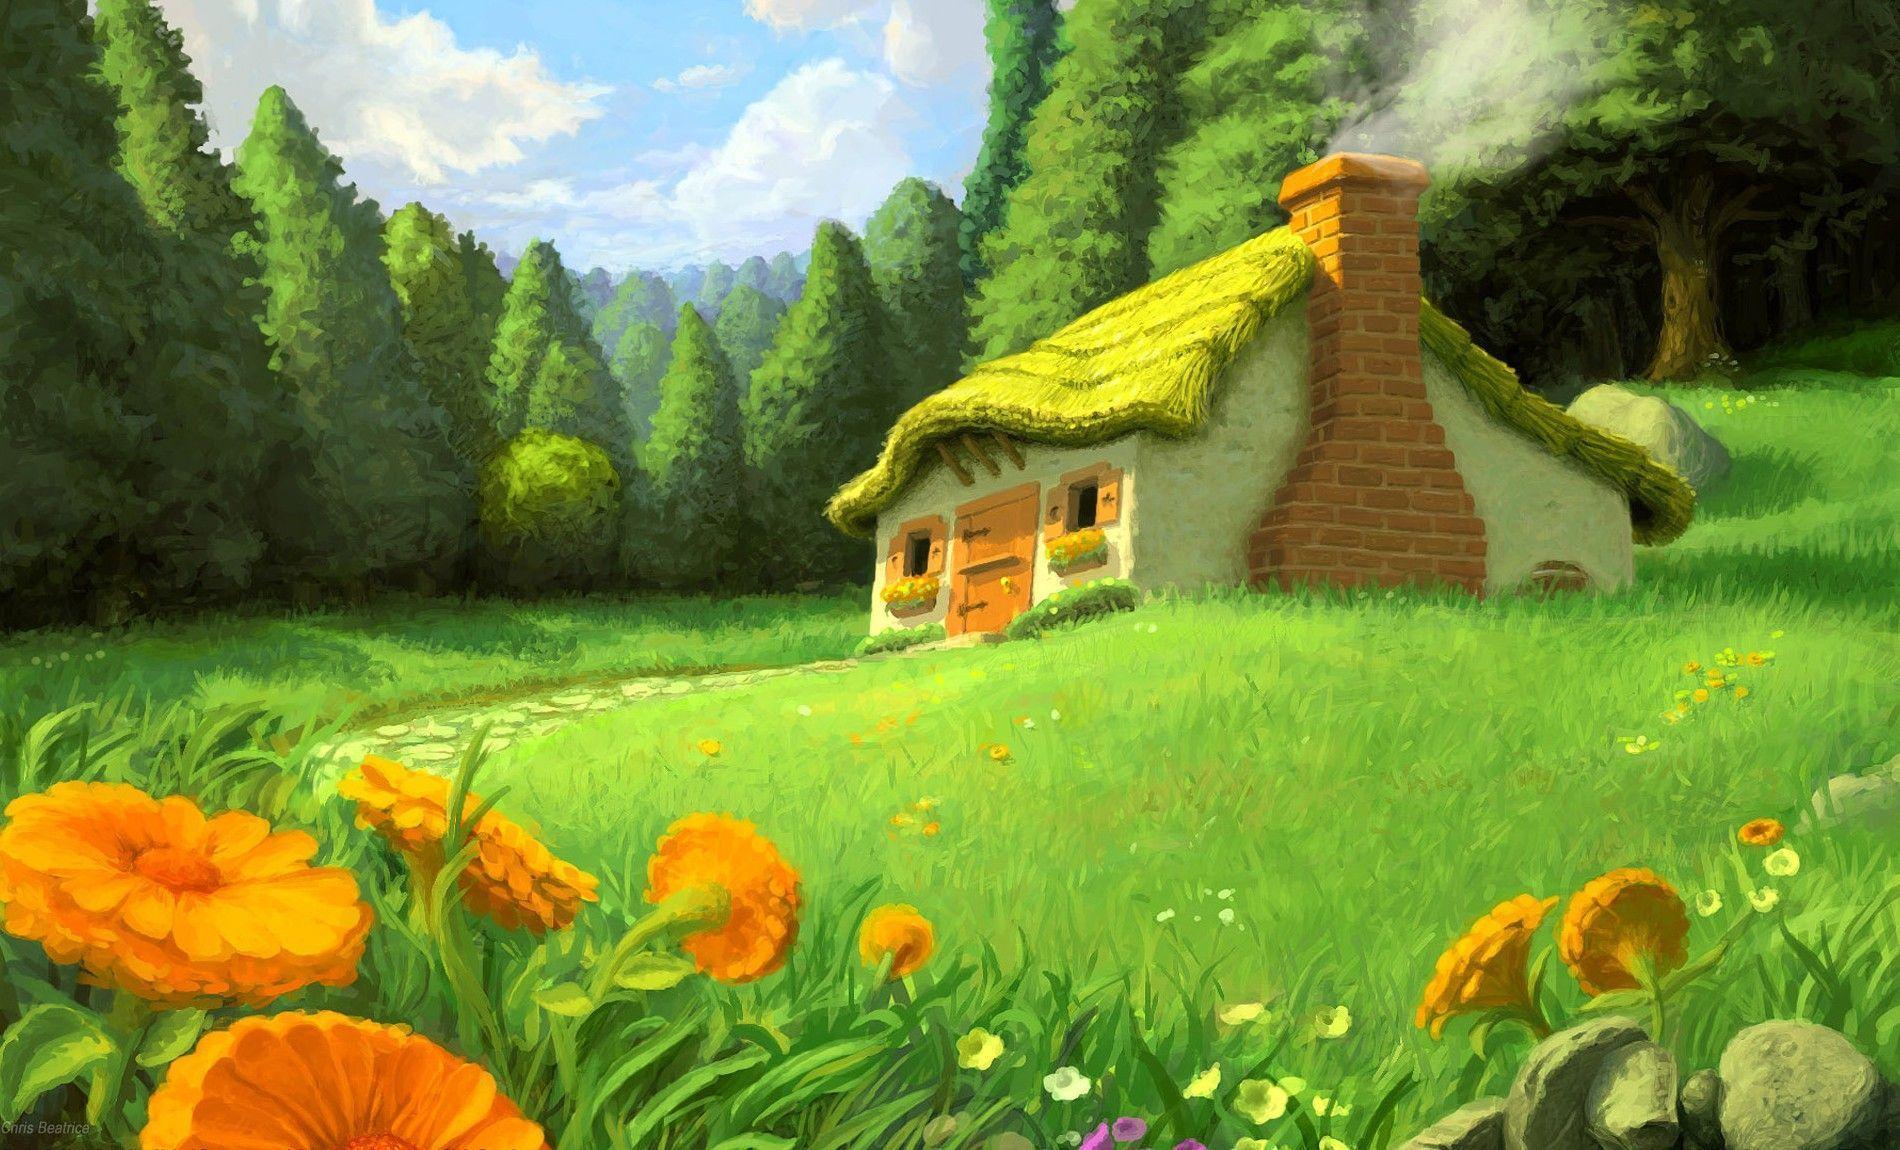 Nature Wallpaper Desktop Full Size Hq Images 12 HD Wallpapers ...